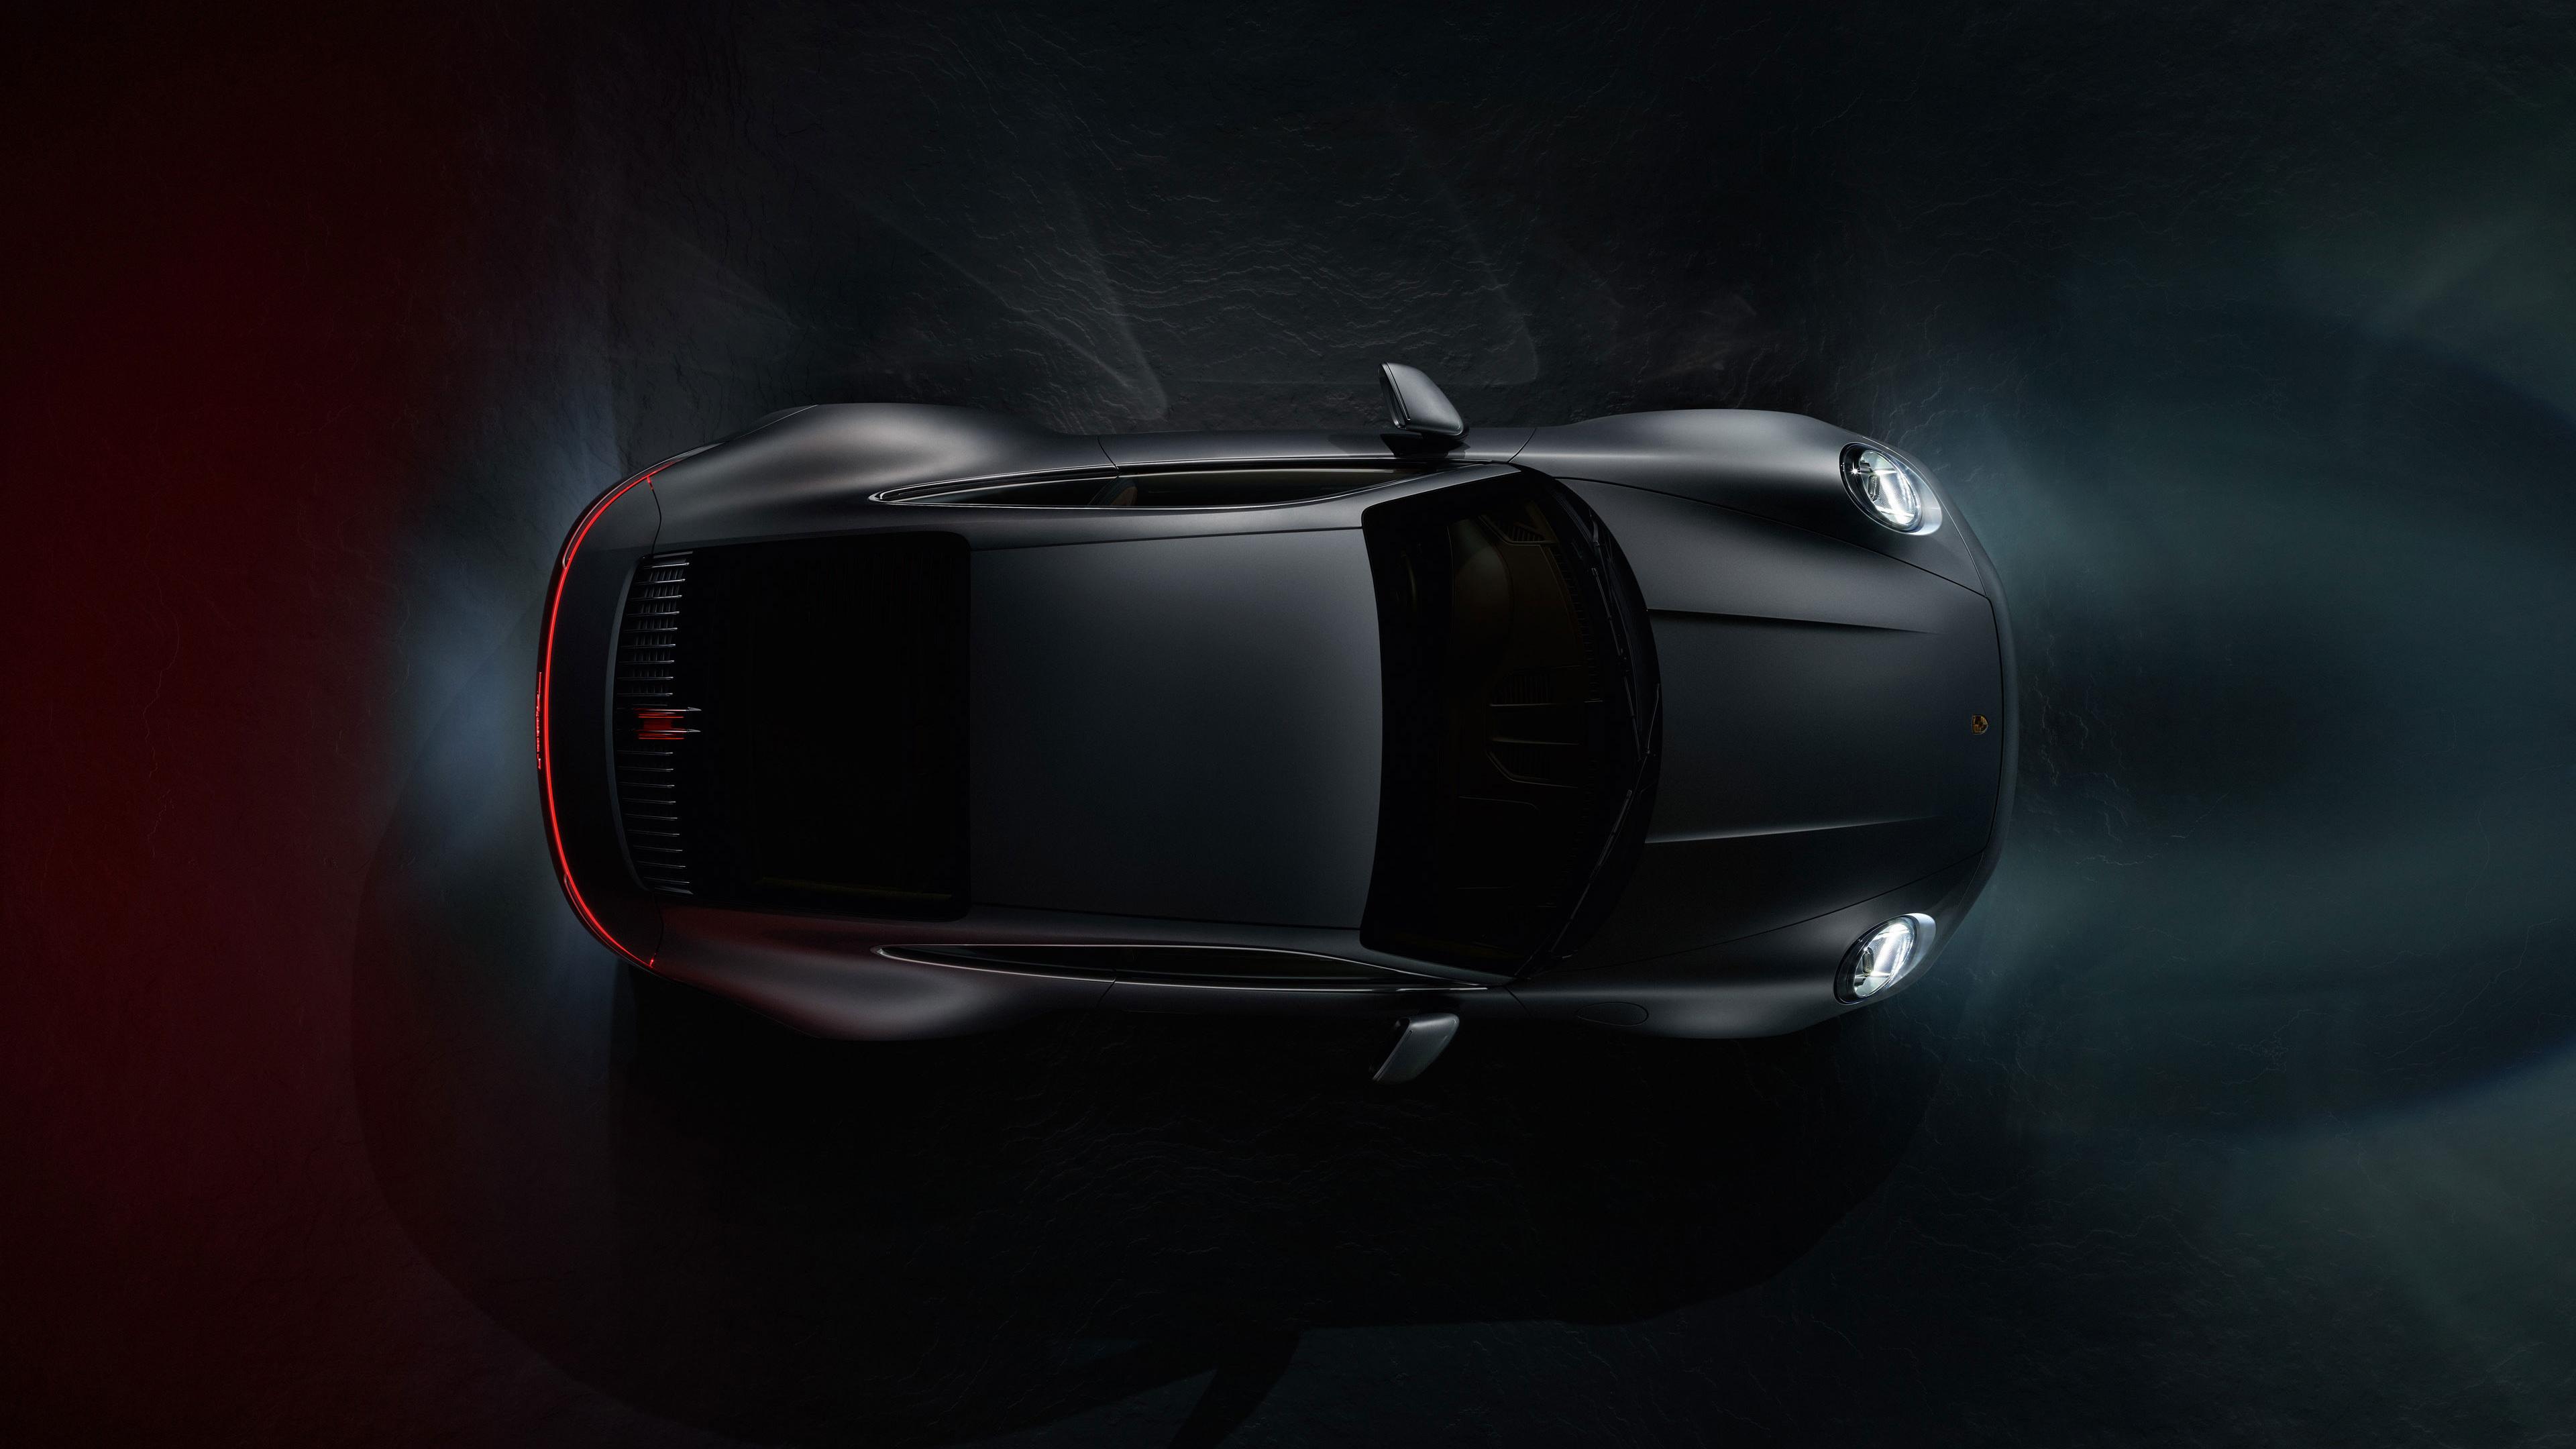 porsche 911 carrera s 2019 4k 1546361957 - Porsche 911 Carrera S 2019 4k - porsche wallpapers, porsche carrera wallpapers, hd-wallpapers, cars wallpapers, 4k-wallpapers, 2019 cars wallpapers